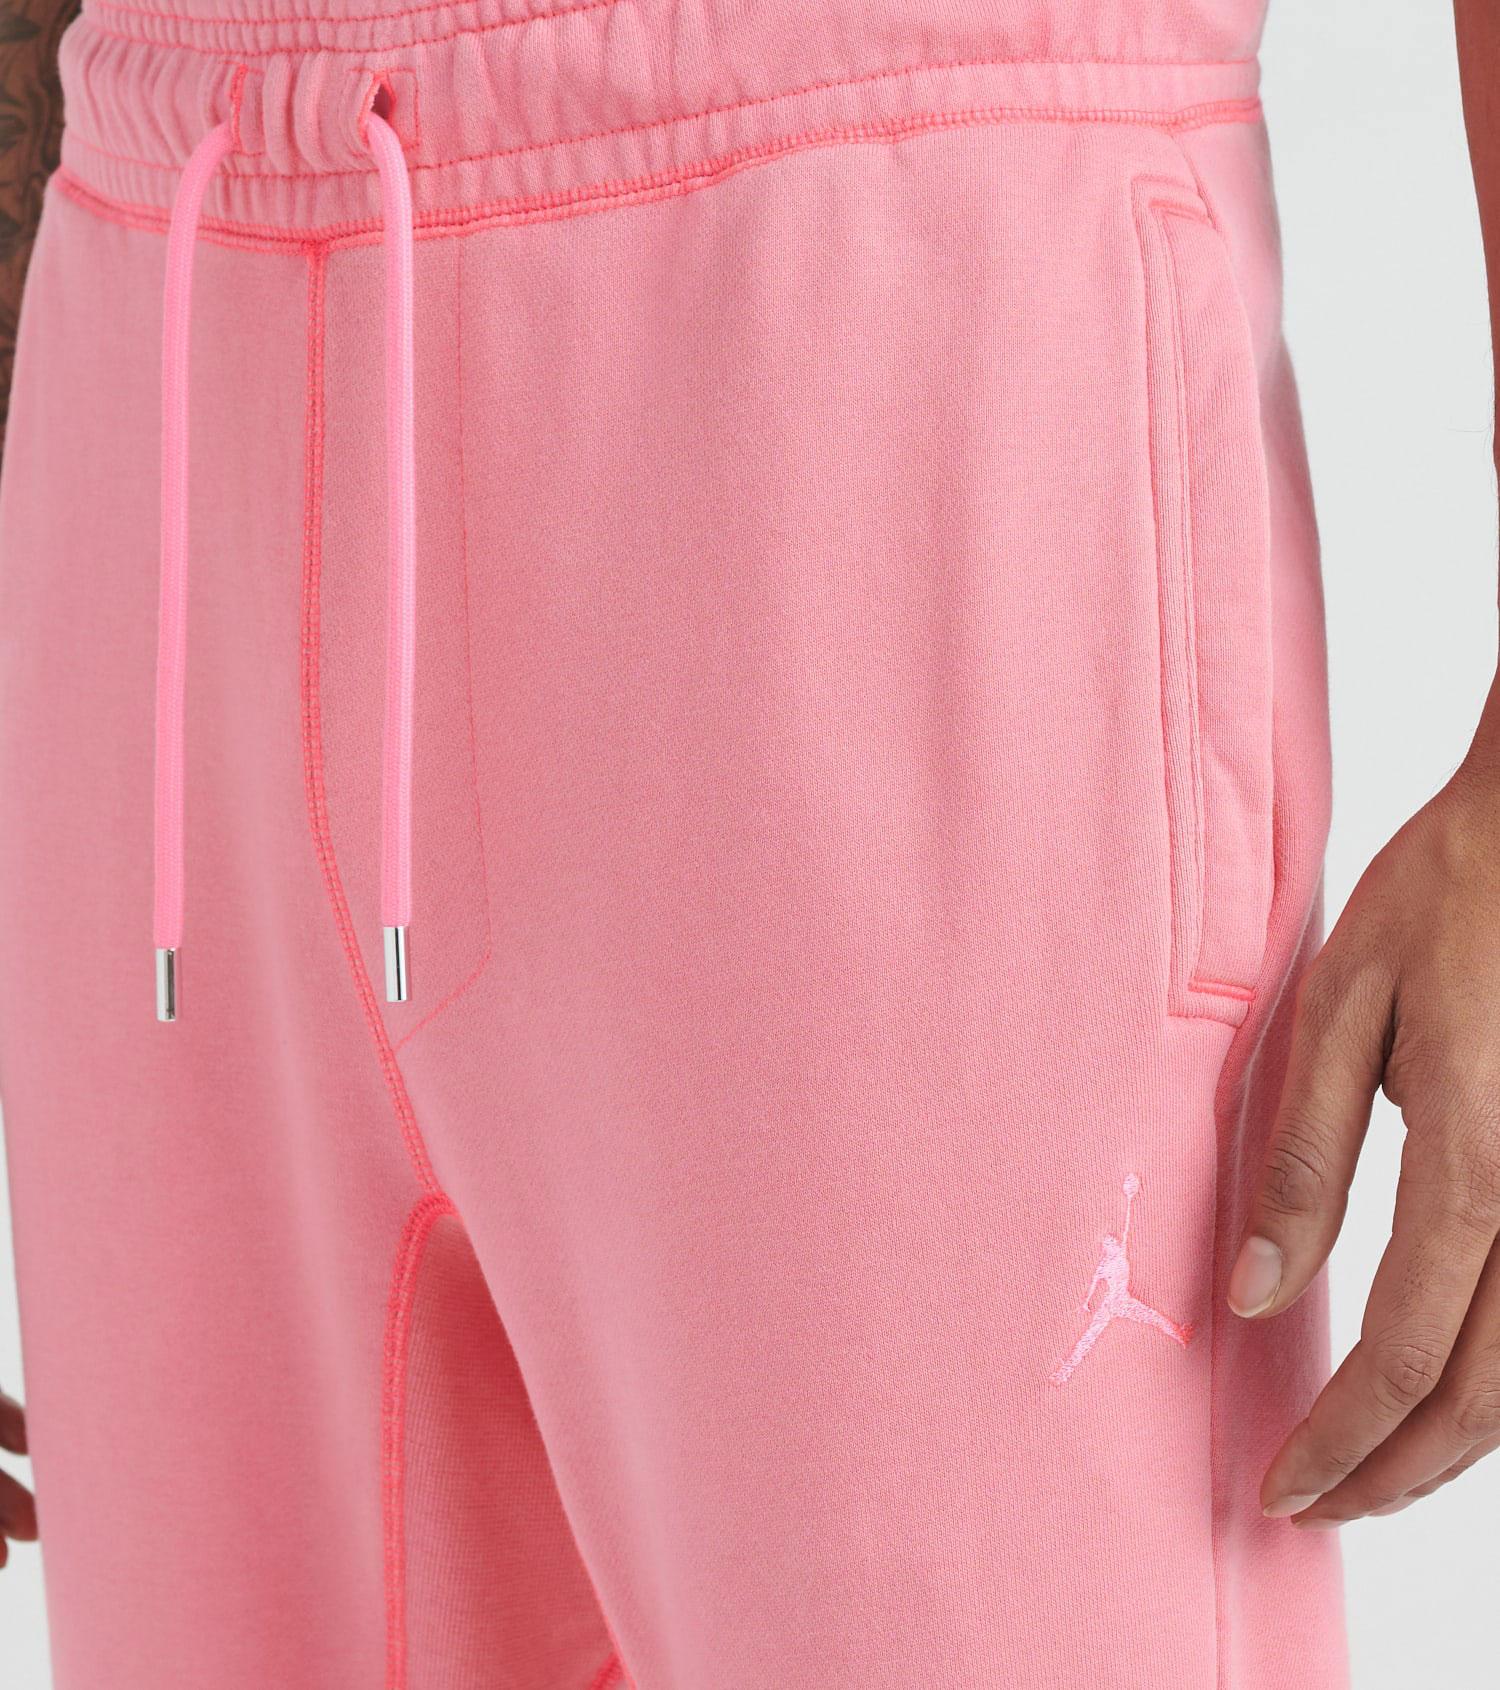 jordan-pink-jogger-pants-3